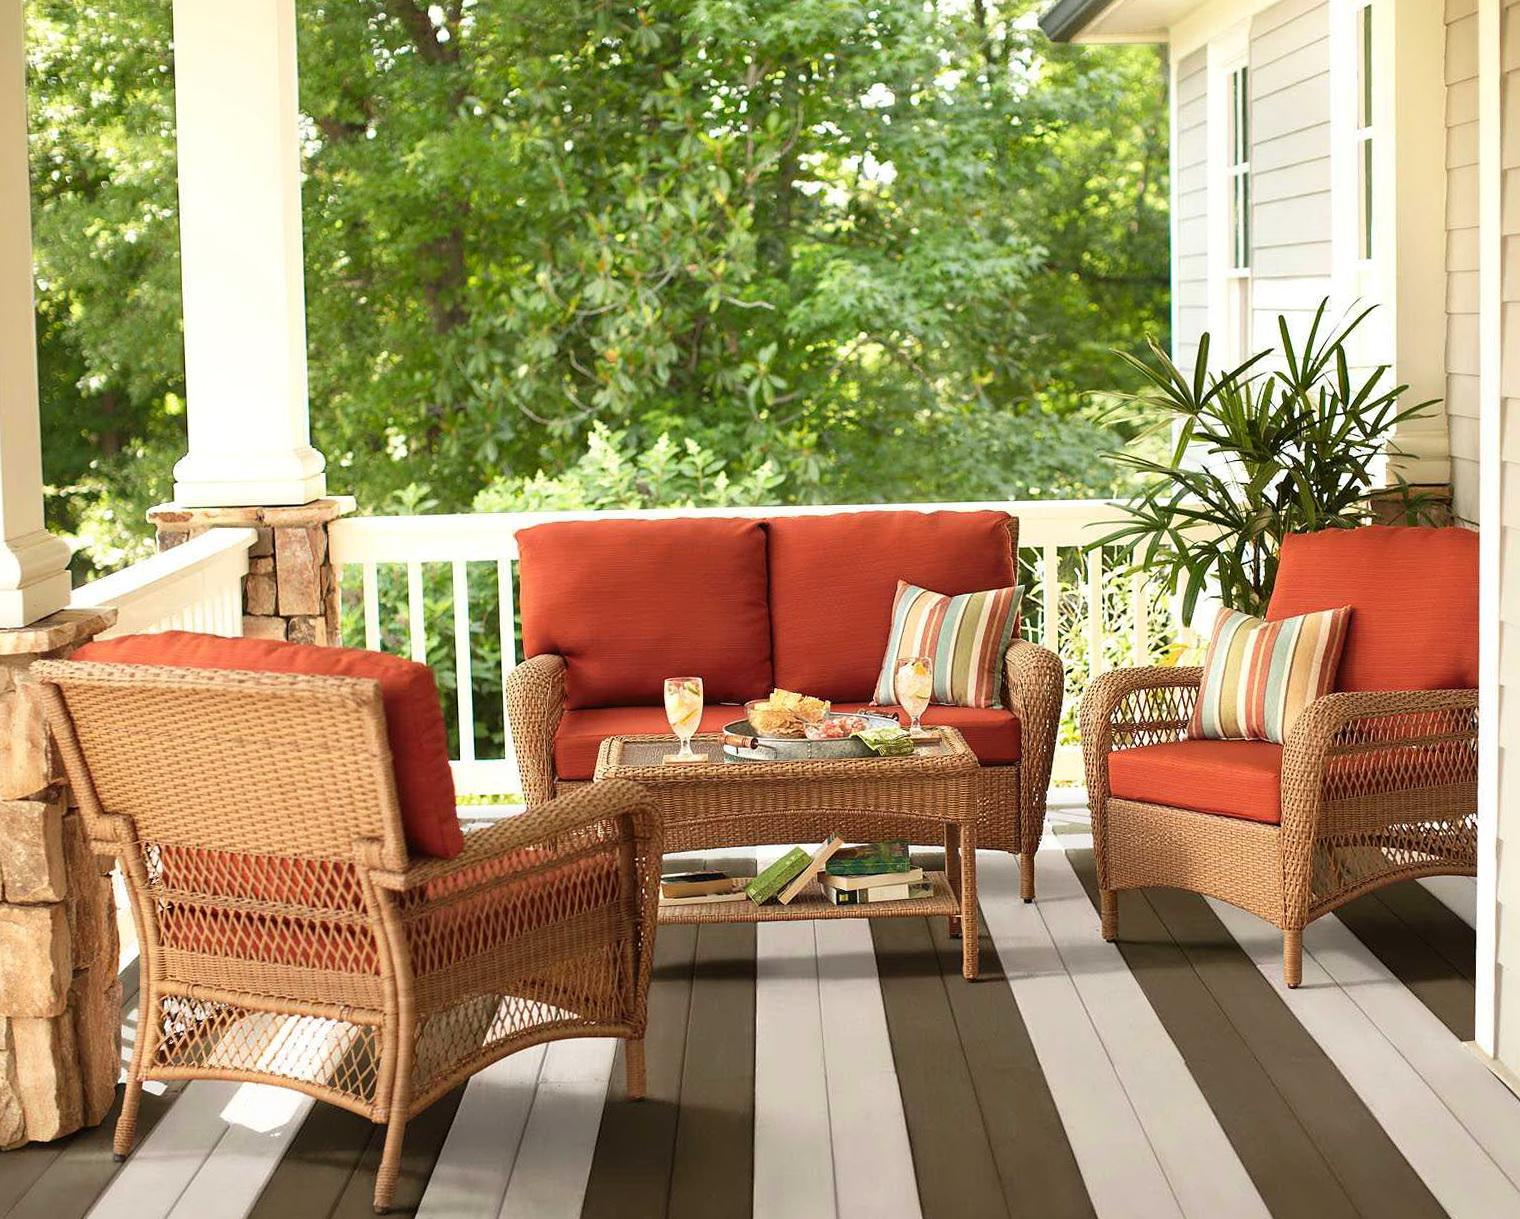 Home Depot Deck Coatings For Wood Decks